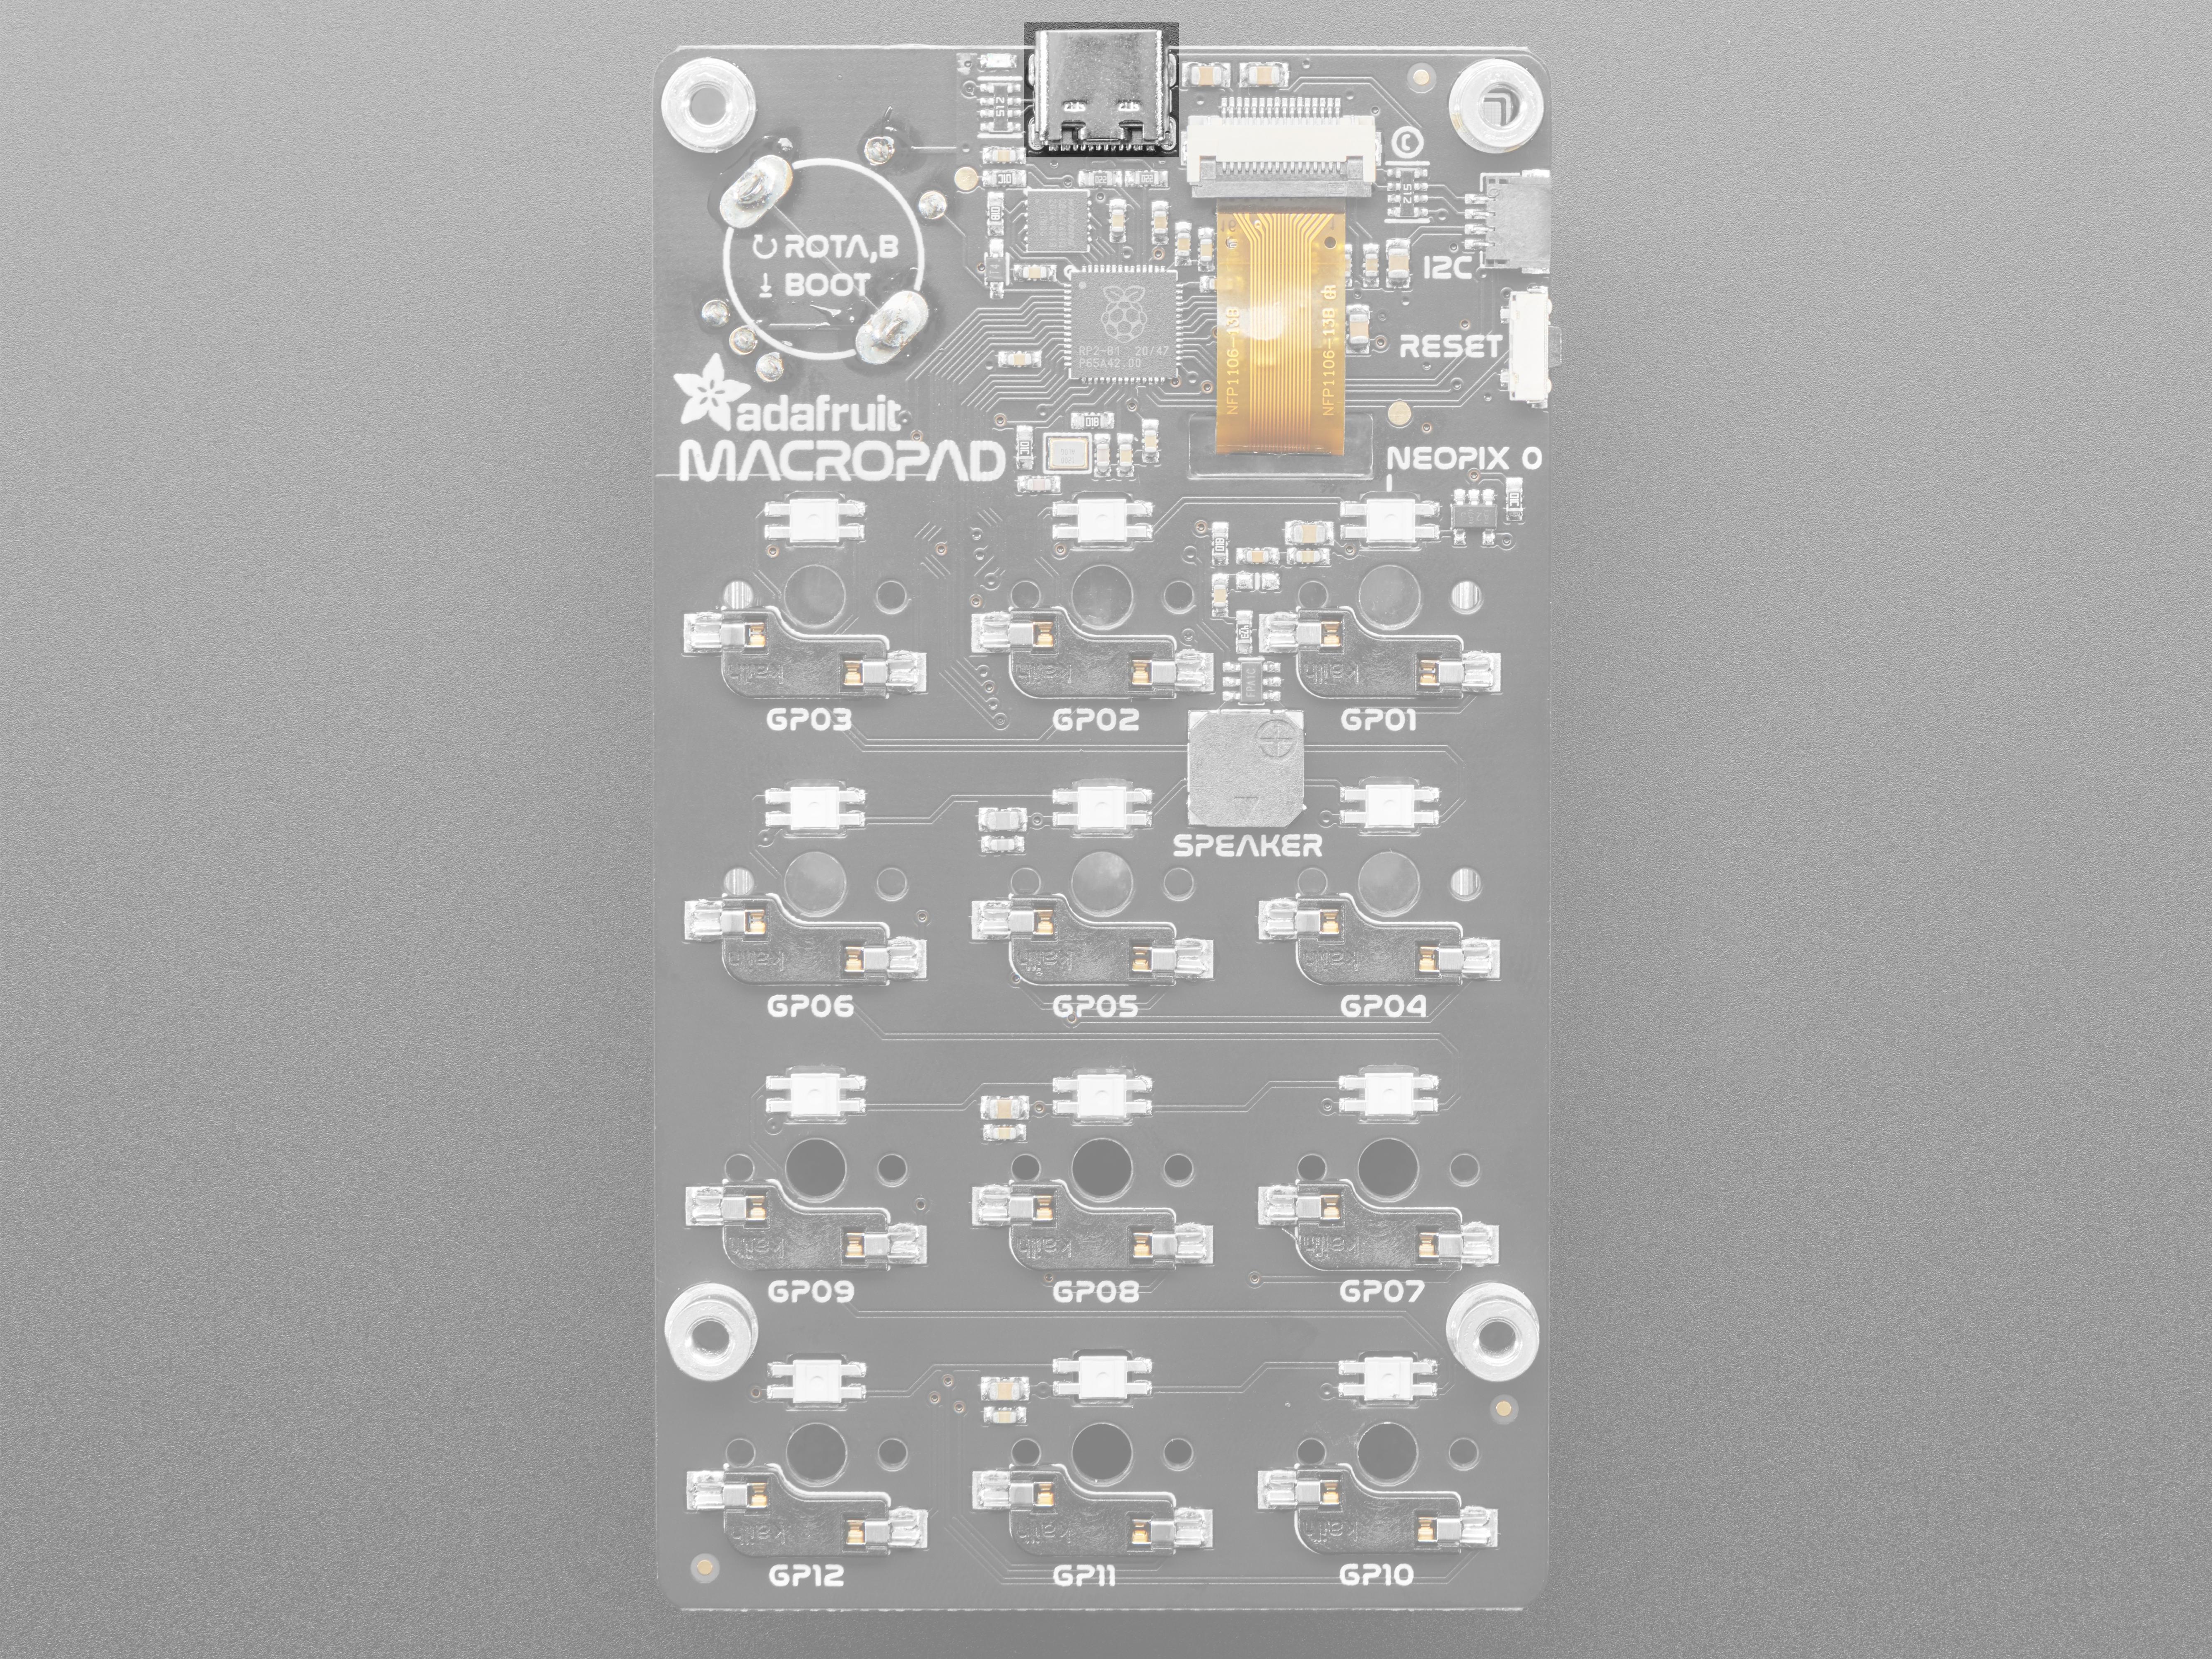 adafruit_products_MacroPad_pinouts_USB_connector.jpg